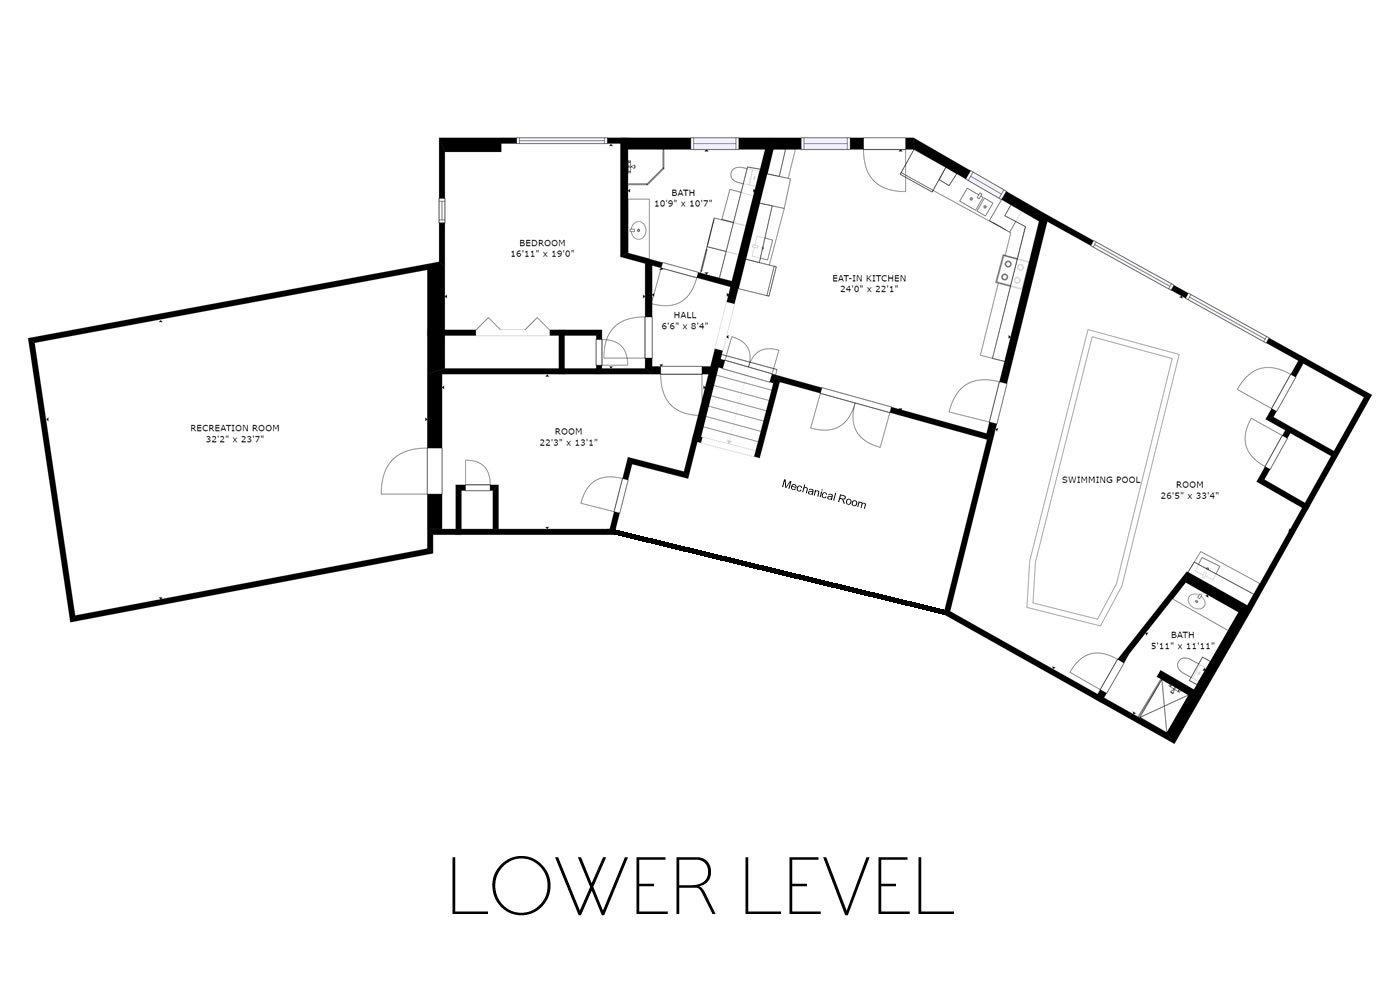 lowerlevel